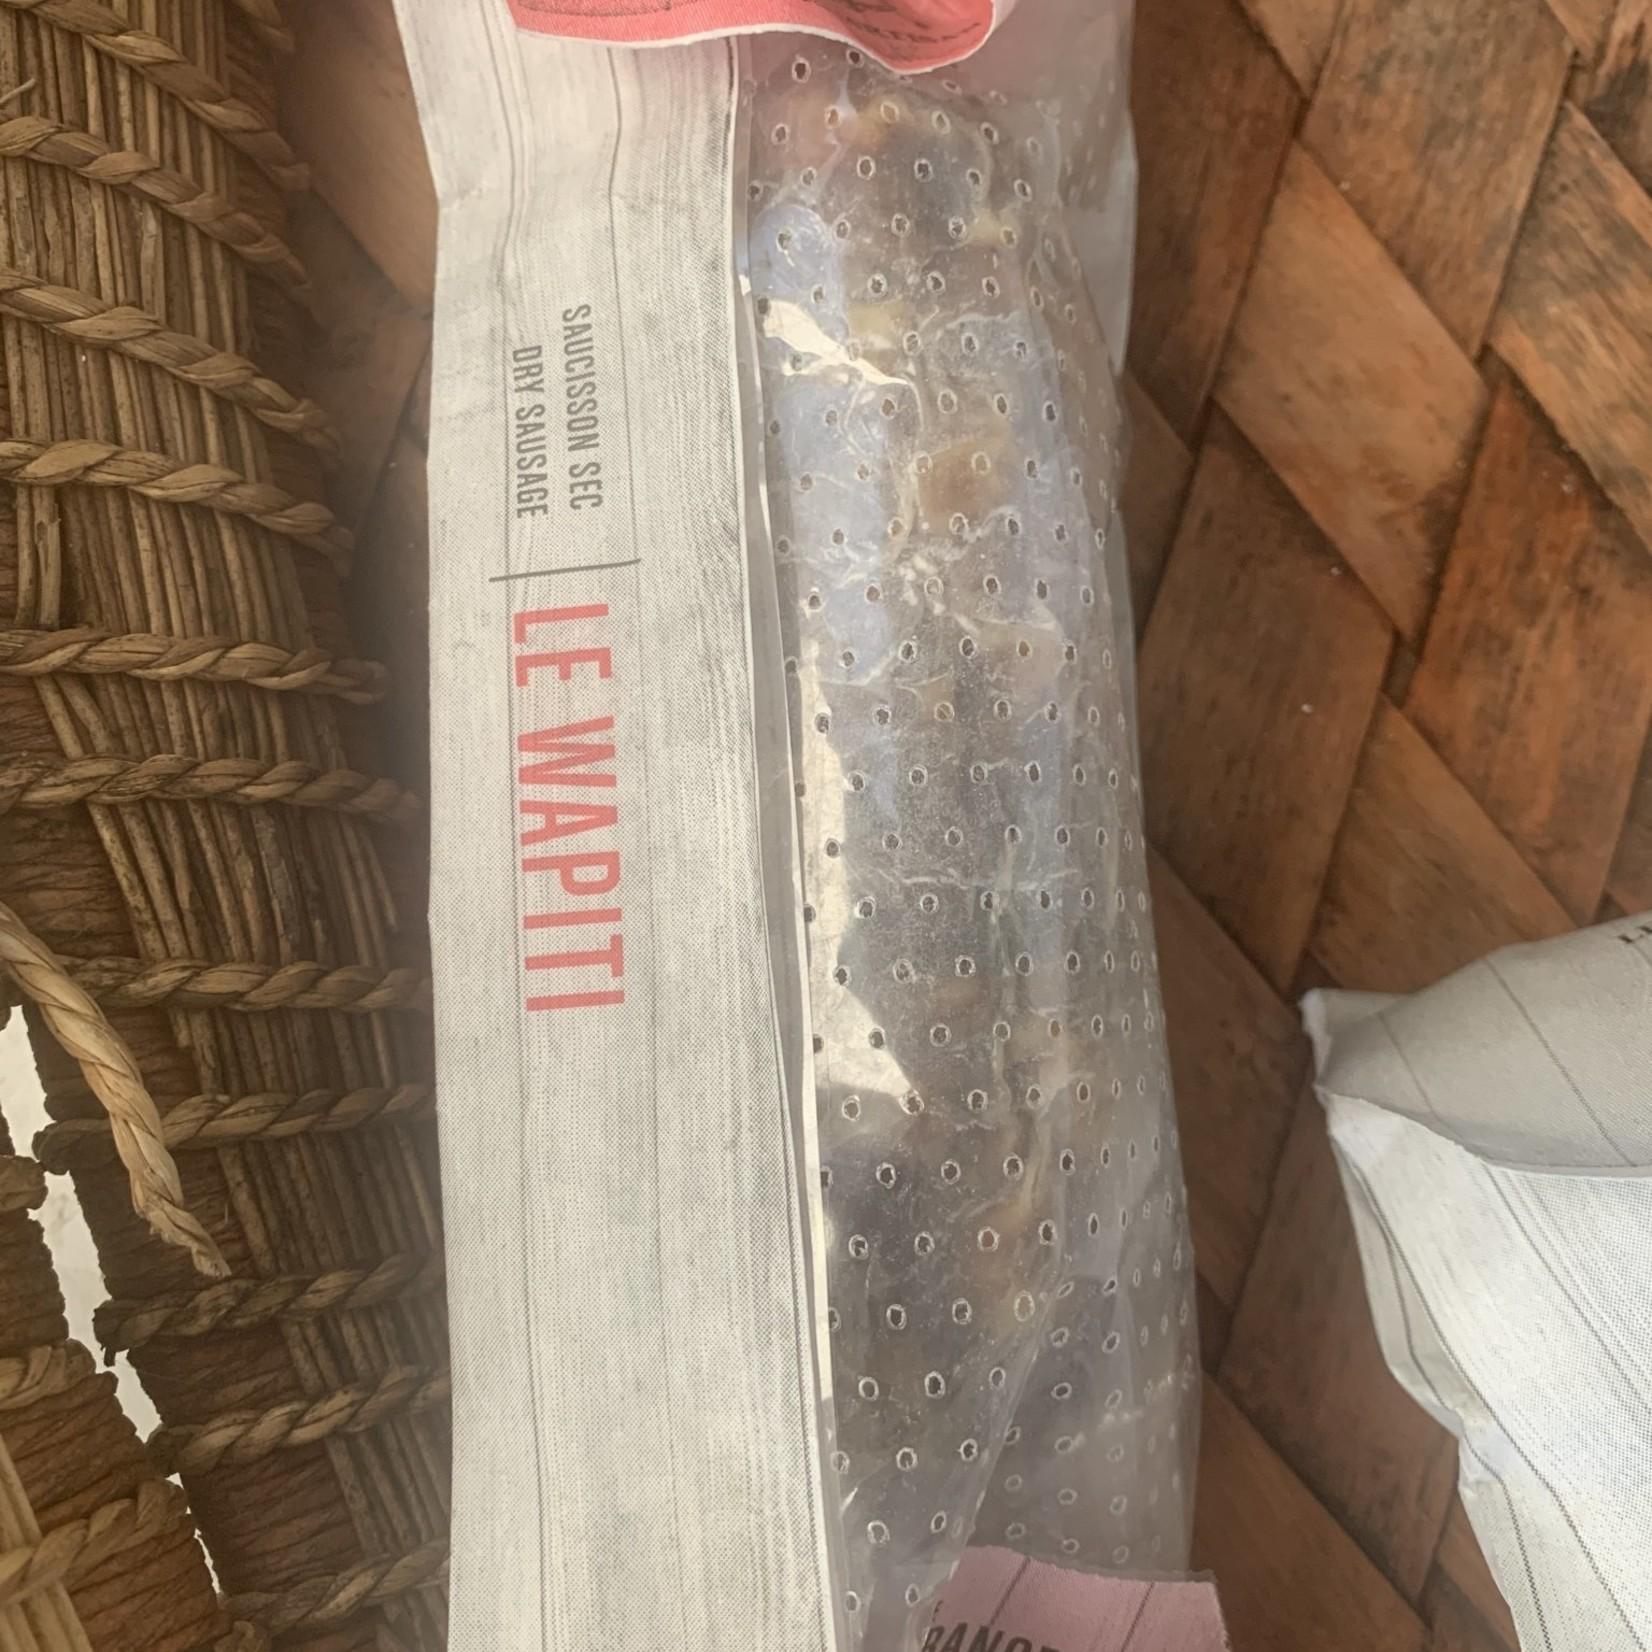 Saucisson artisanal - Le Wapiti